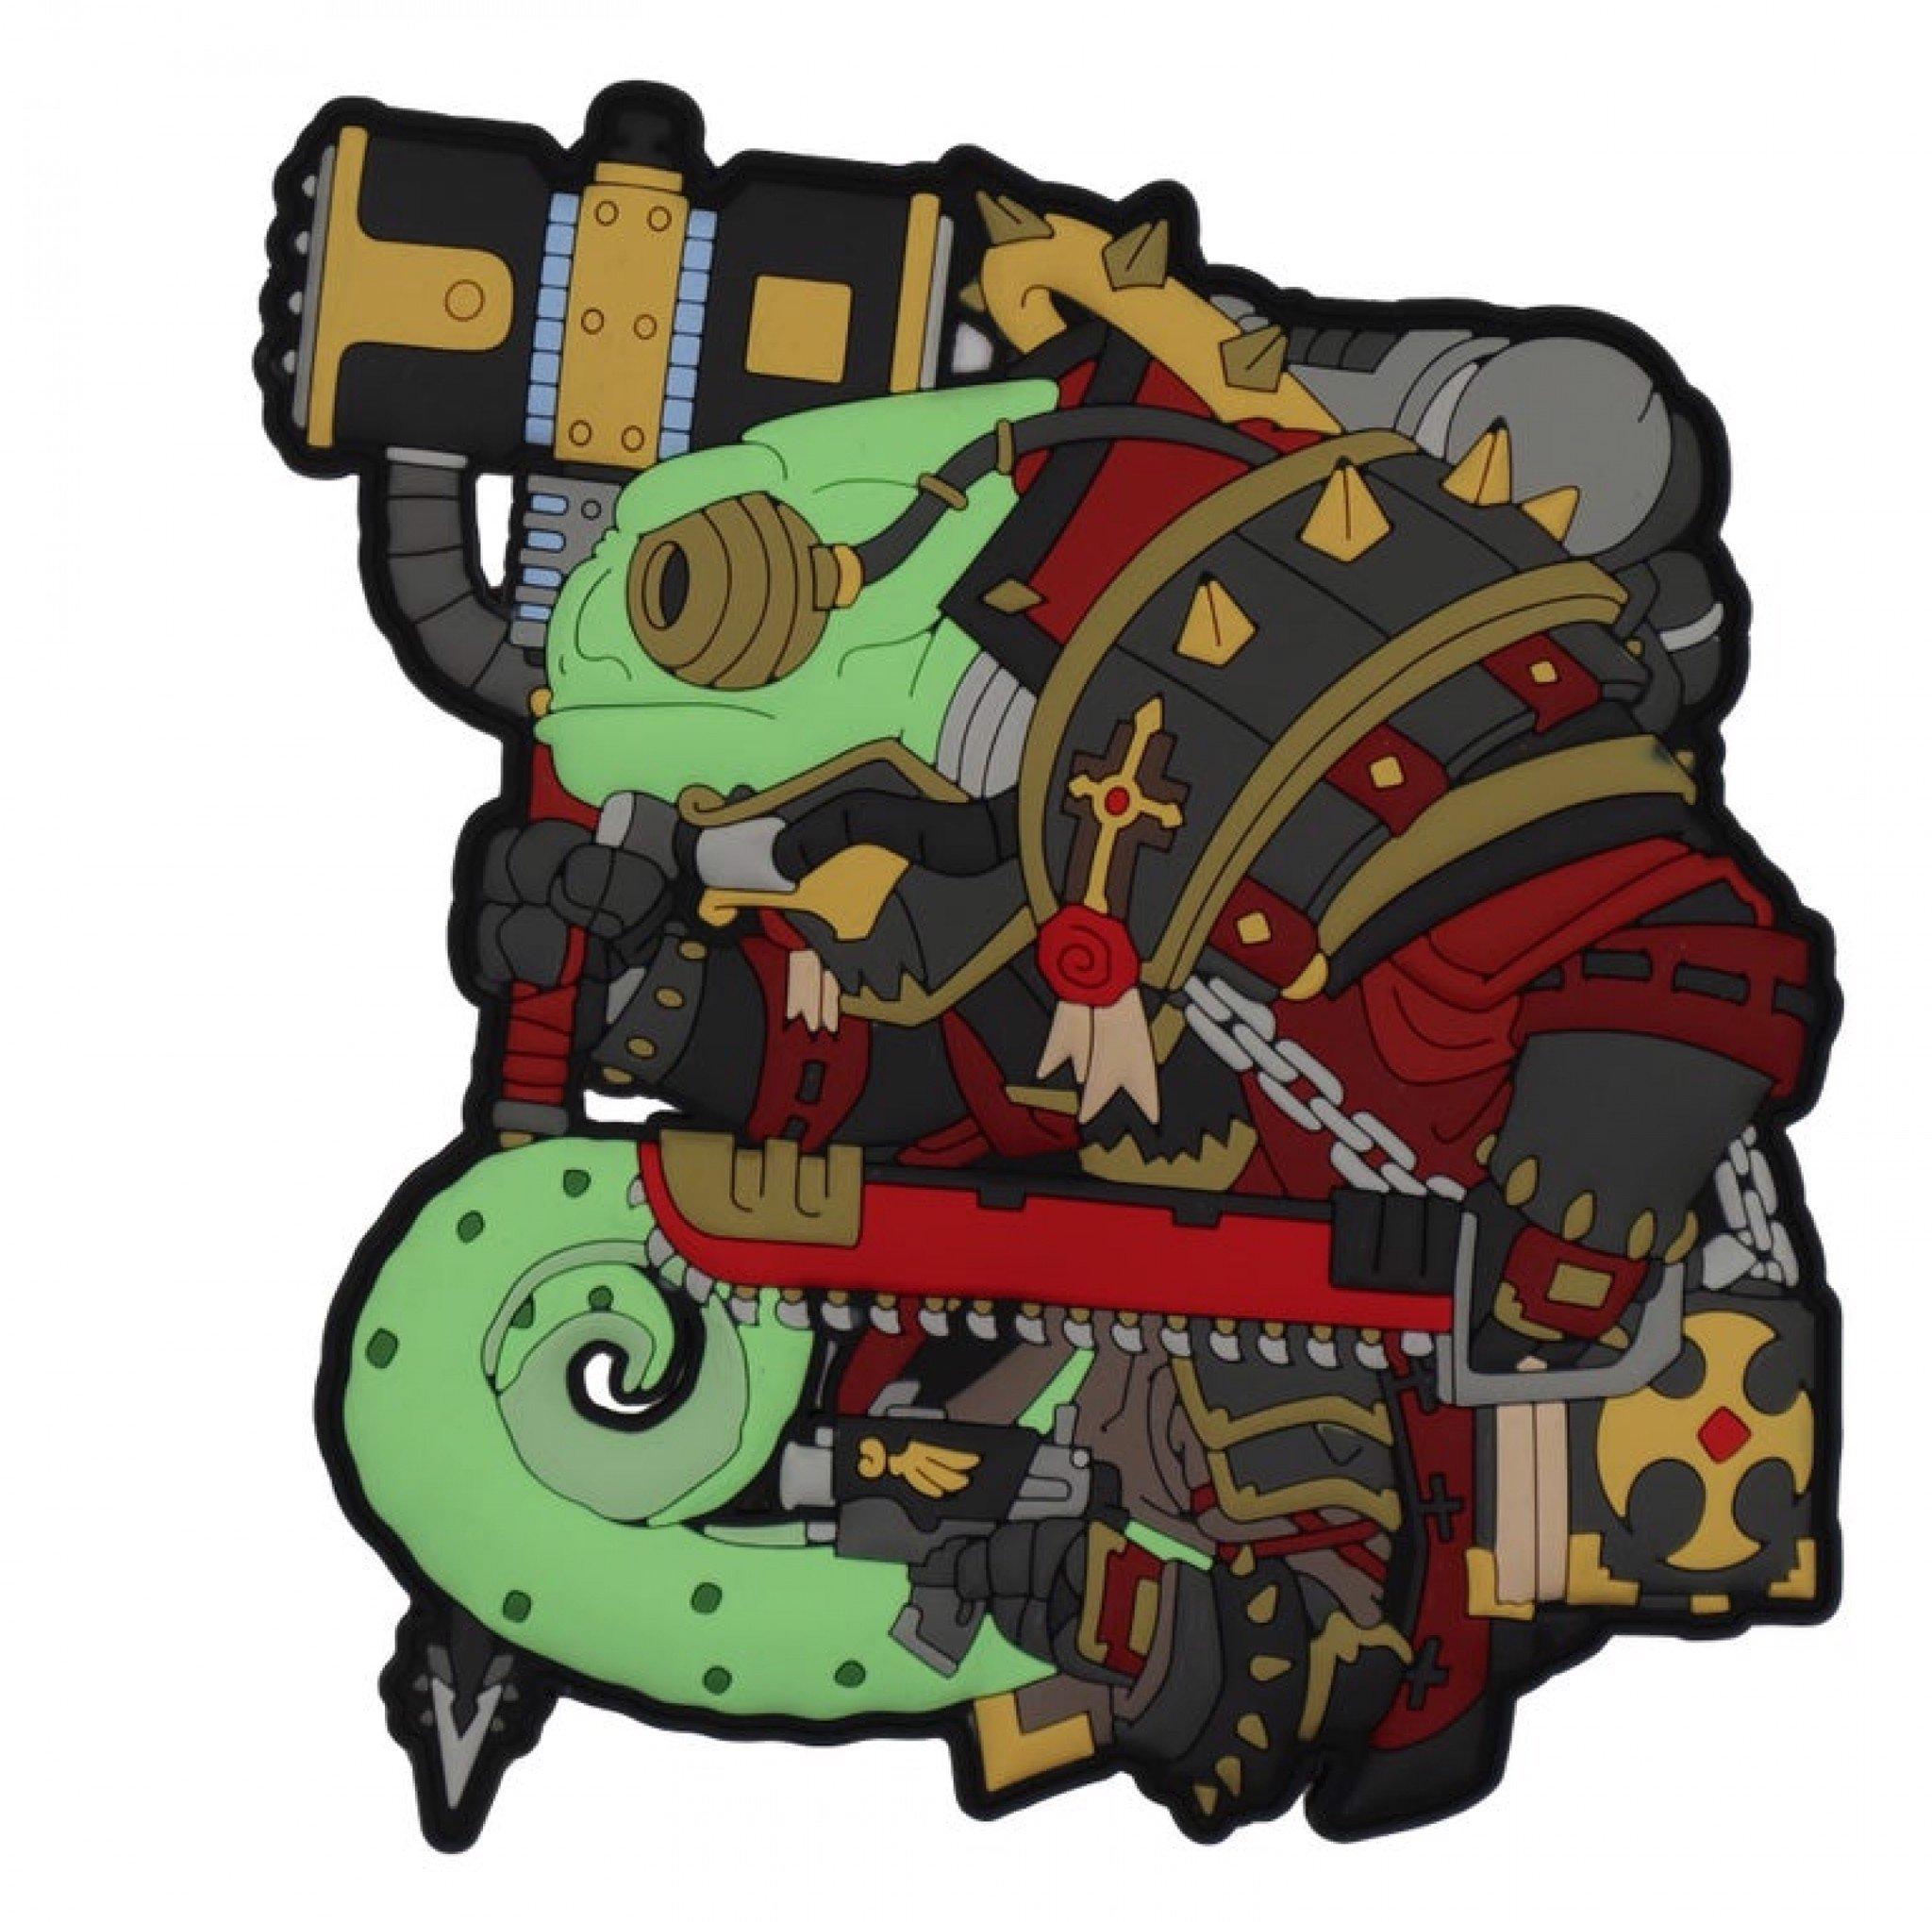 Tacopsgear Chameleon legion INQUISITOR Patch